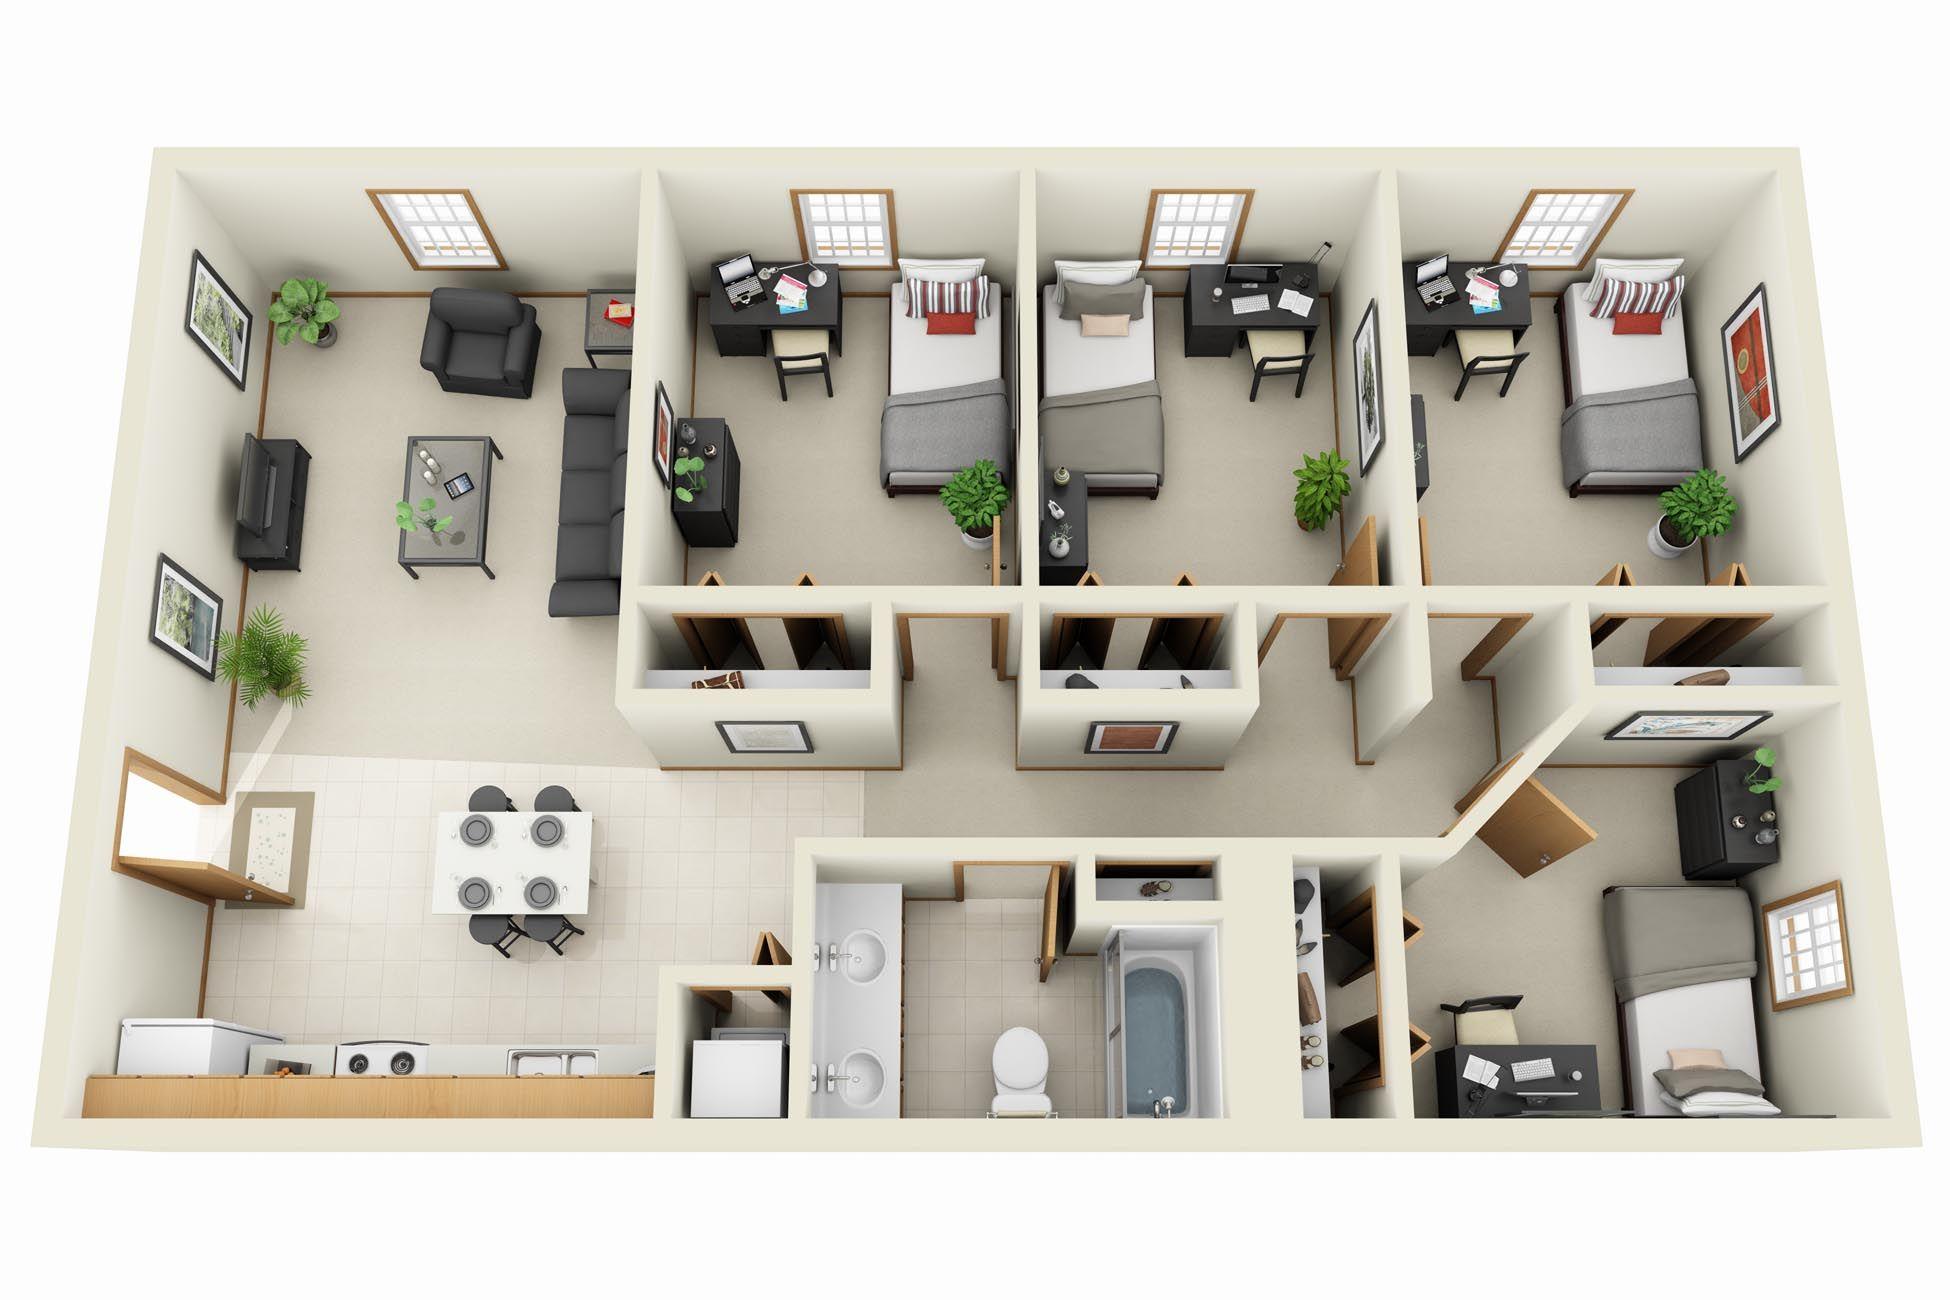 3d floor plan apartment Google Search